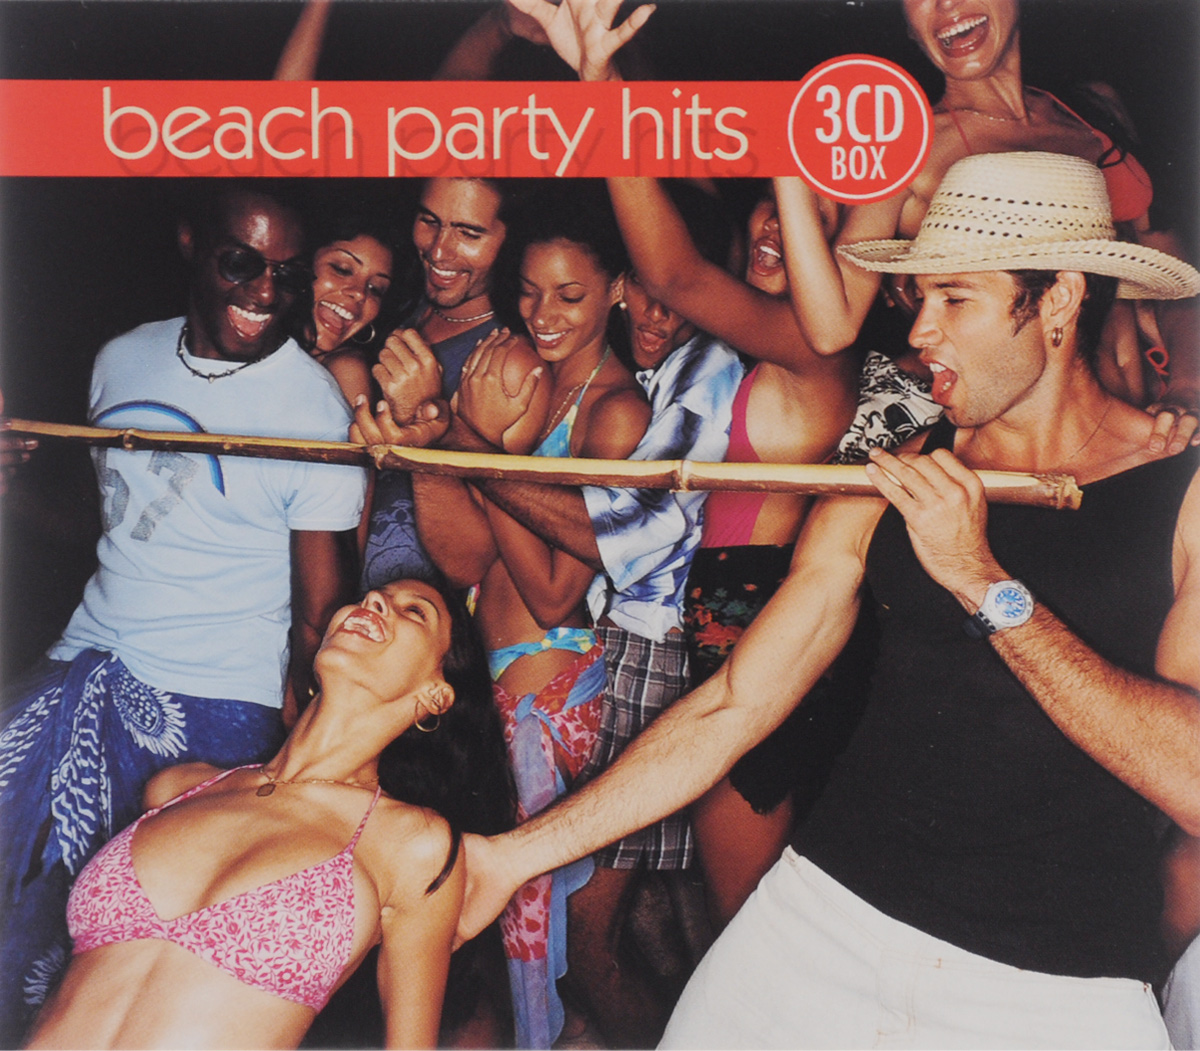 "Тина Чарльз,""The Blue Chips"",Tricky Girls,""Jump & Joy!"",3t,""Karmah"",In-Grid,""Carrilio"",Франческо Наполи,""Beach Bumpers"",""Inner Feeling"",Дженнифер Лопес,Марсель Романов,""Activate"",`CoColoCo`,Марга Дредд,""TNN"",""24th Street"",`Los Piranas`,""Sunflash"",Da Copa Kids,Reggae-Esque,Justine Earp,Уолтер Нита,Джесси Грин Beach Party Hits (3 CD)"